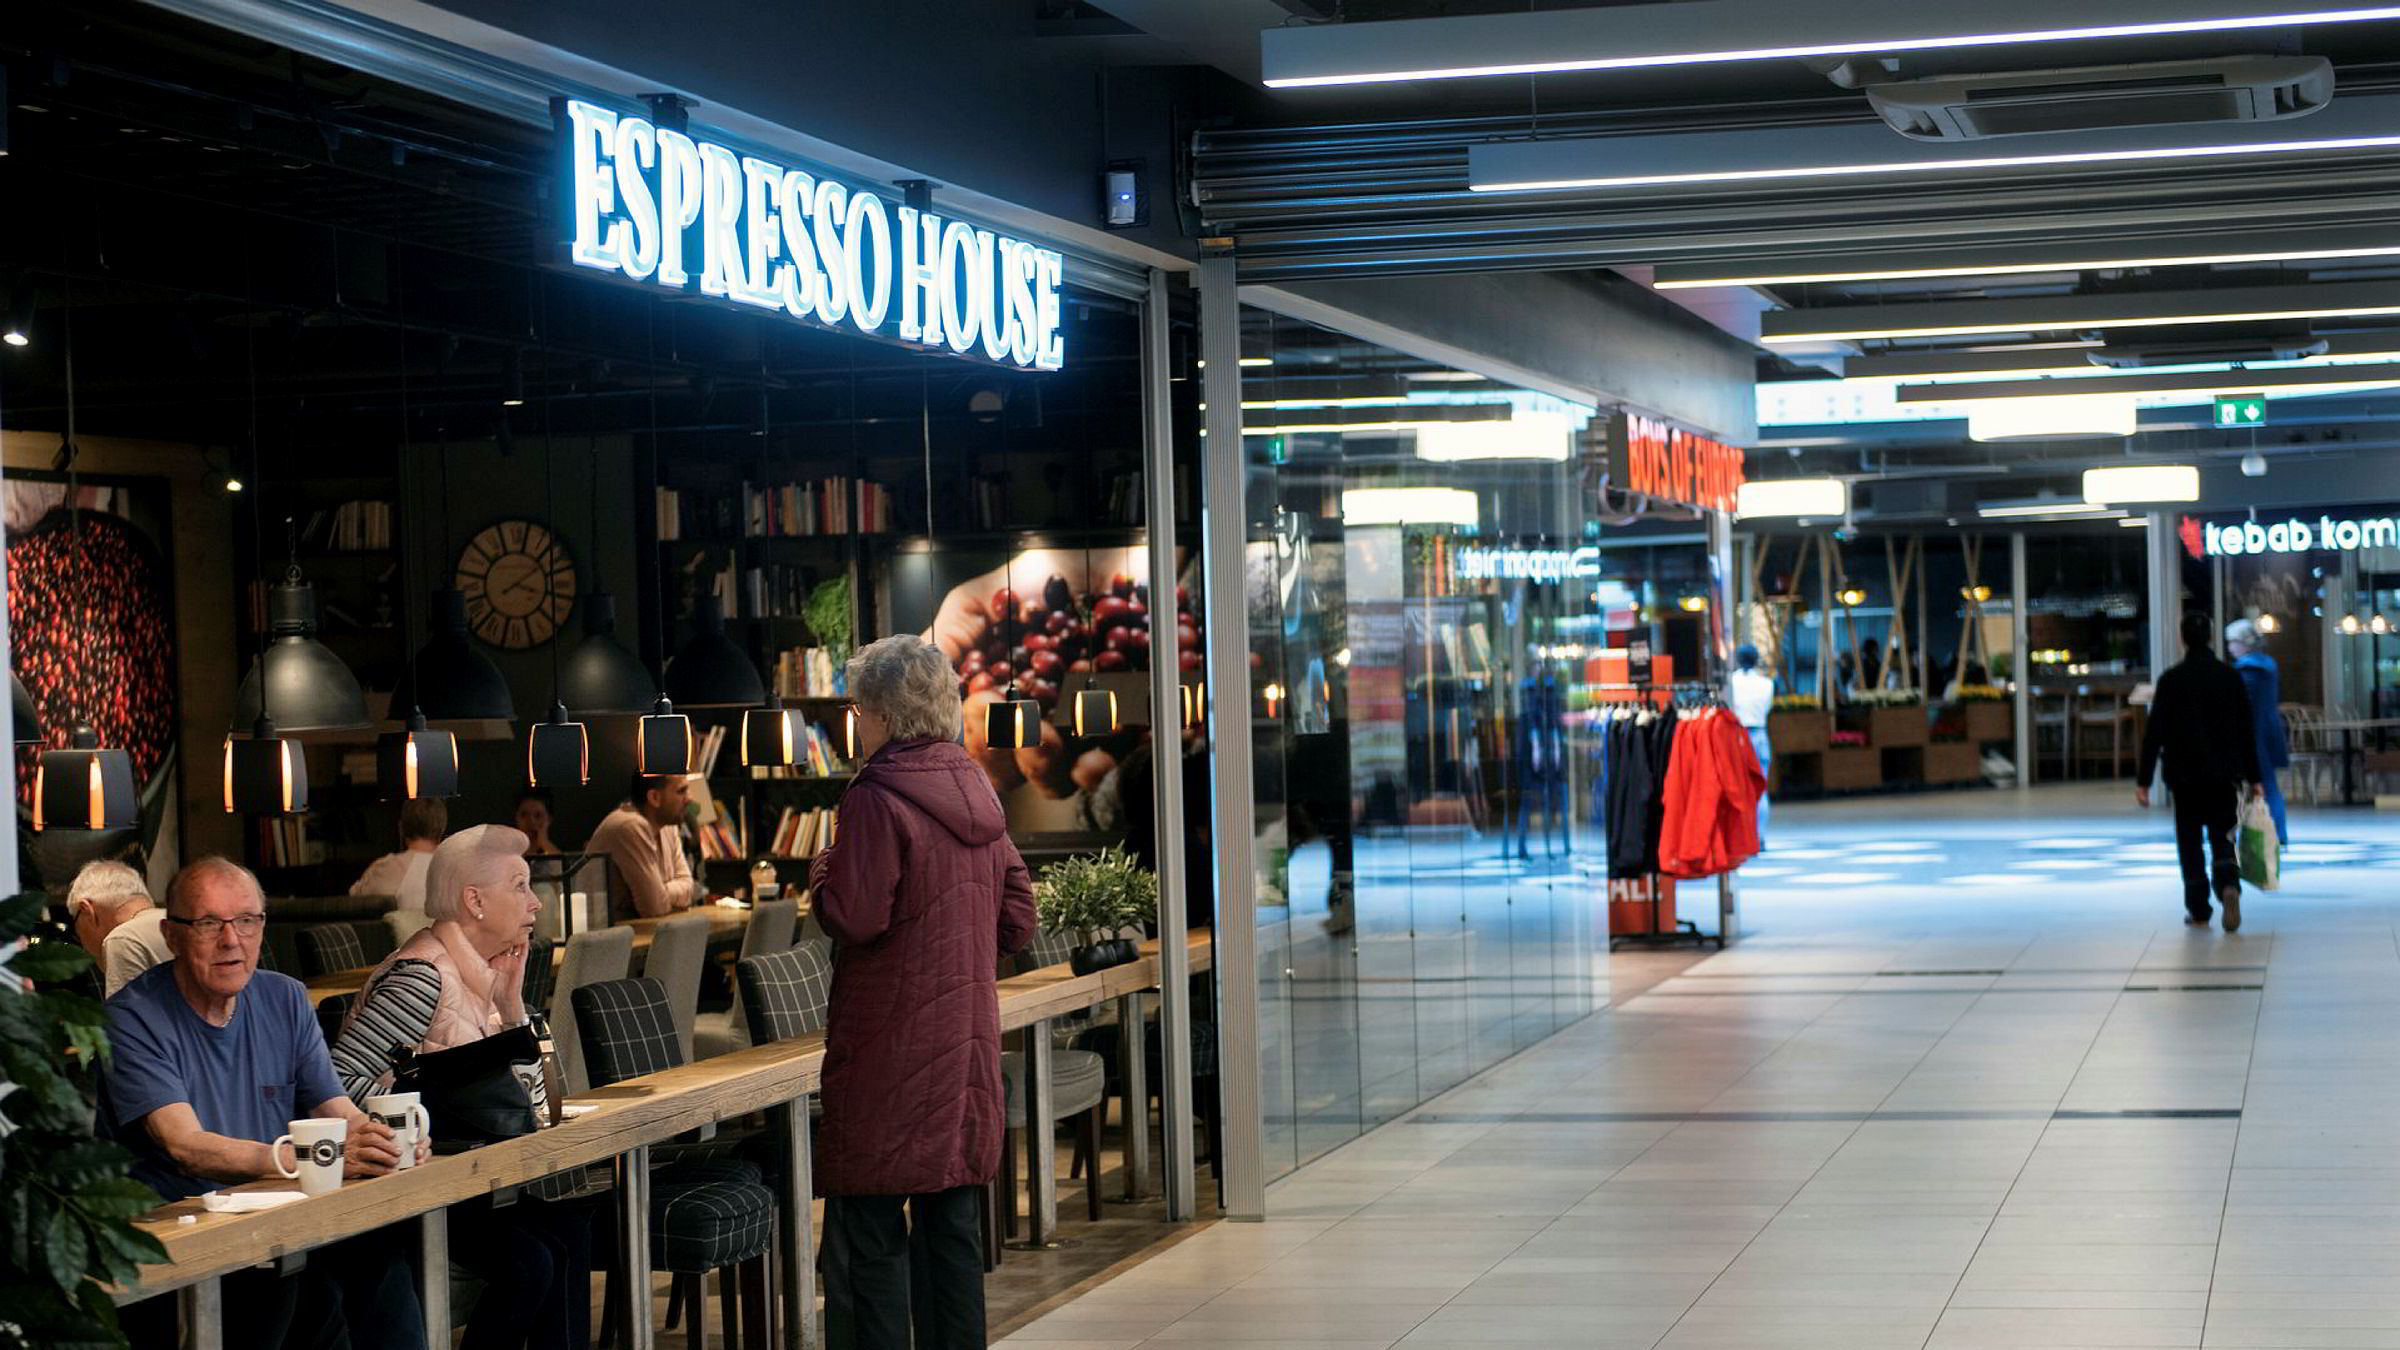 Espresso House på Stovner Senter.